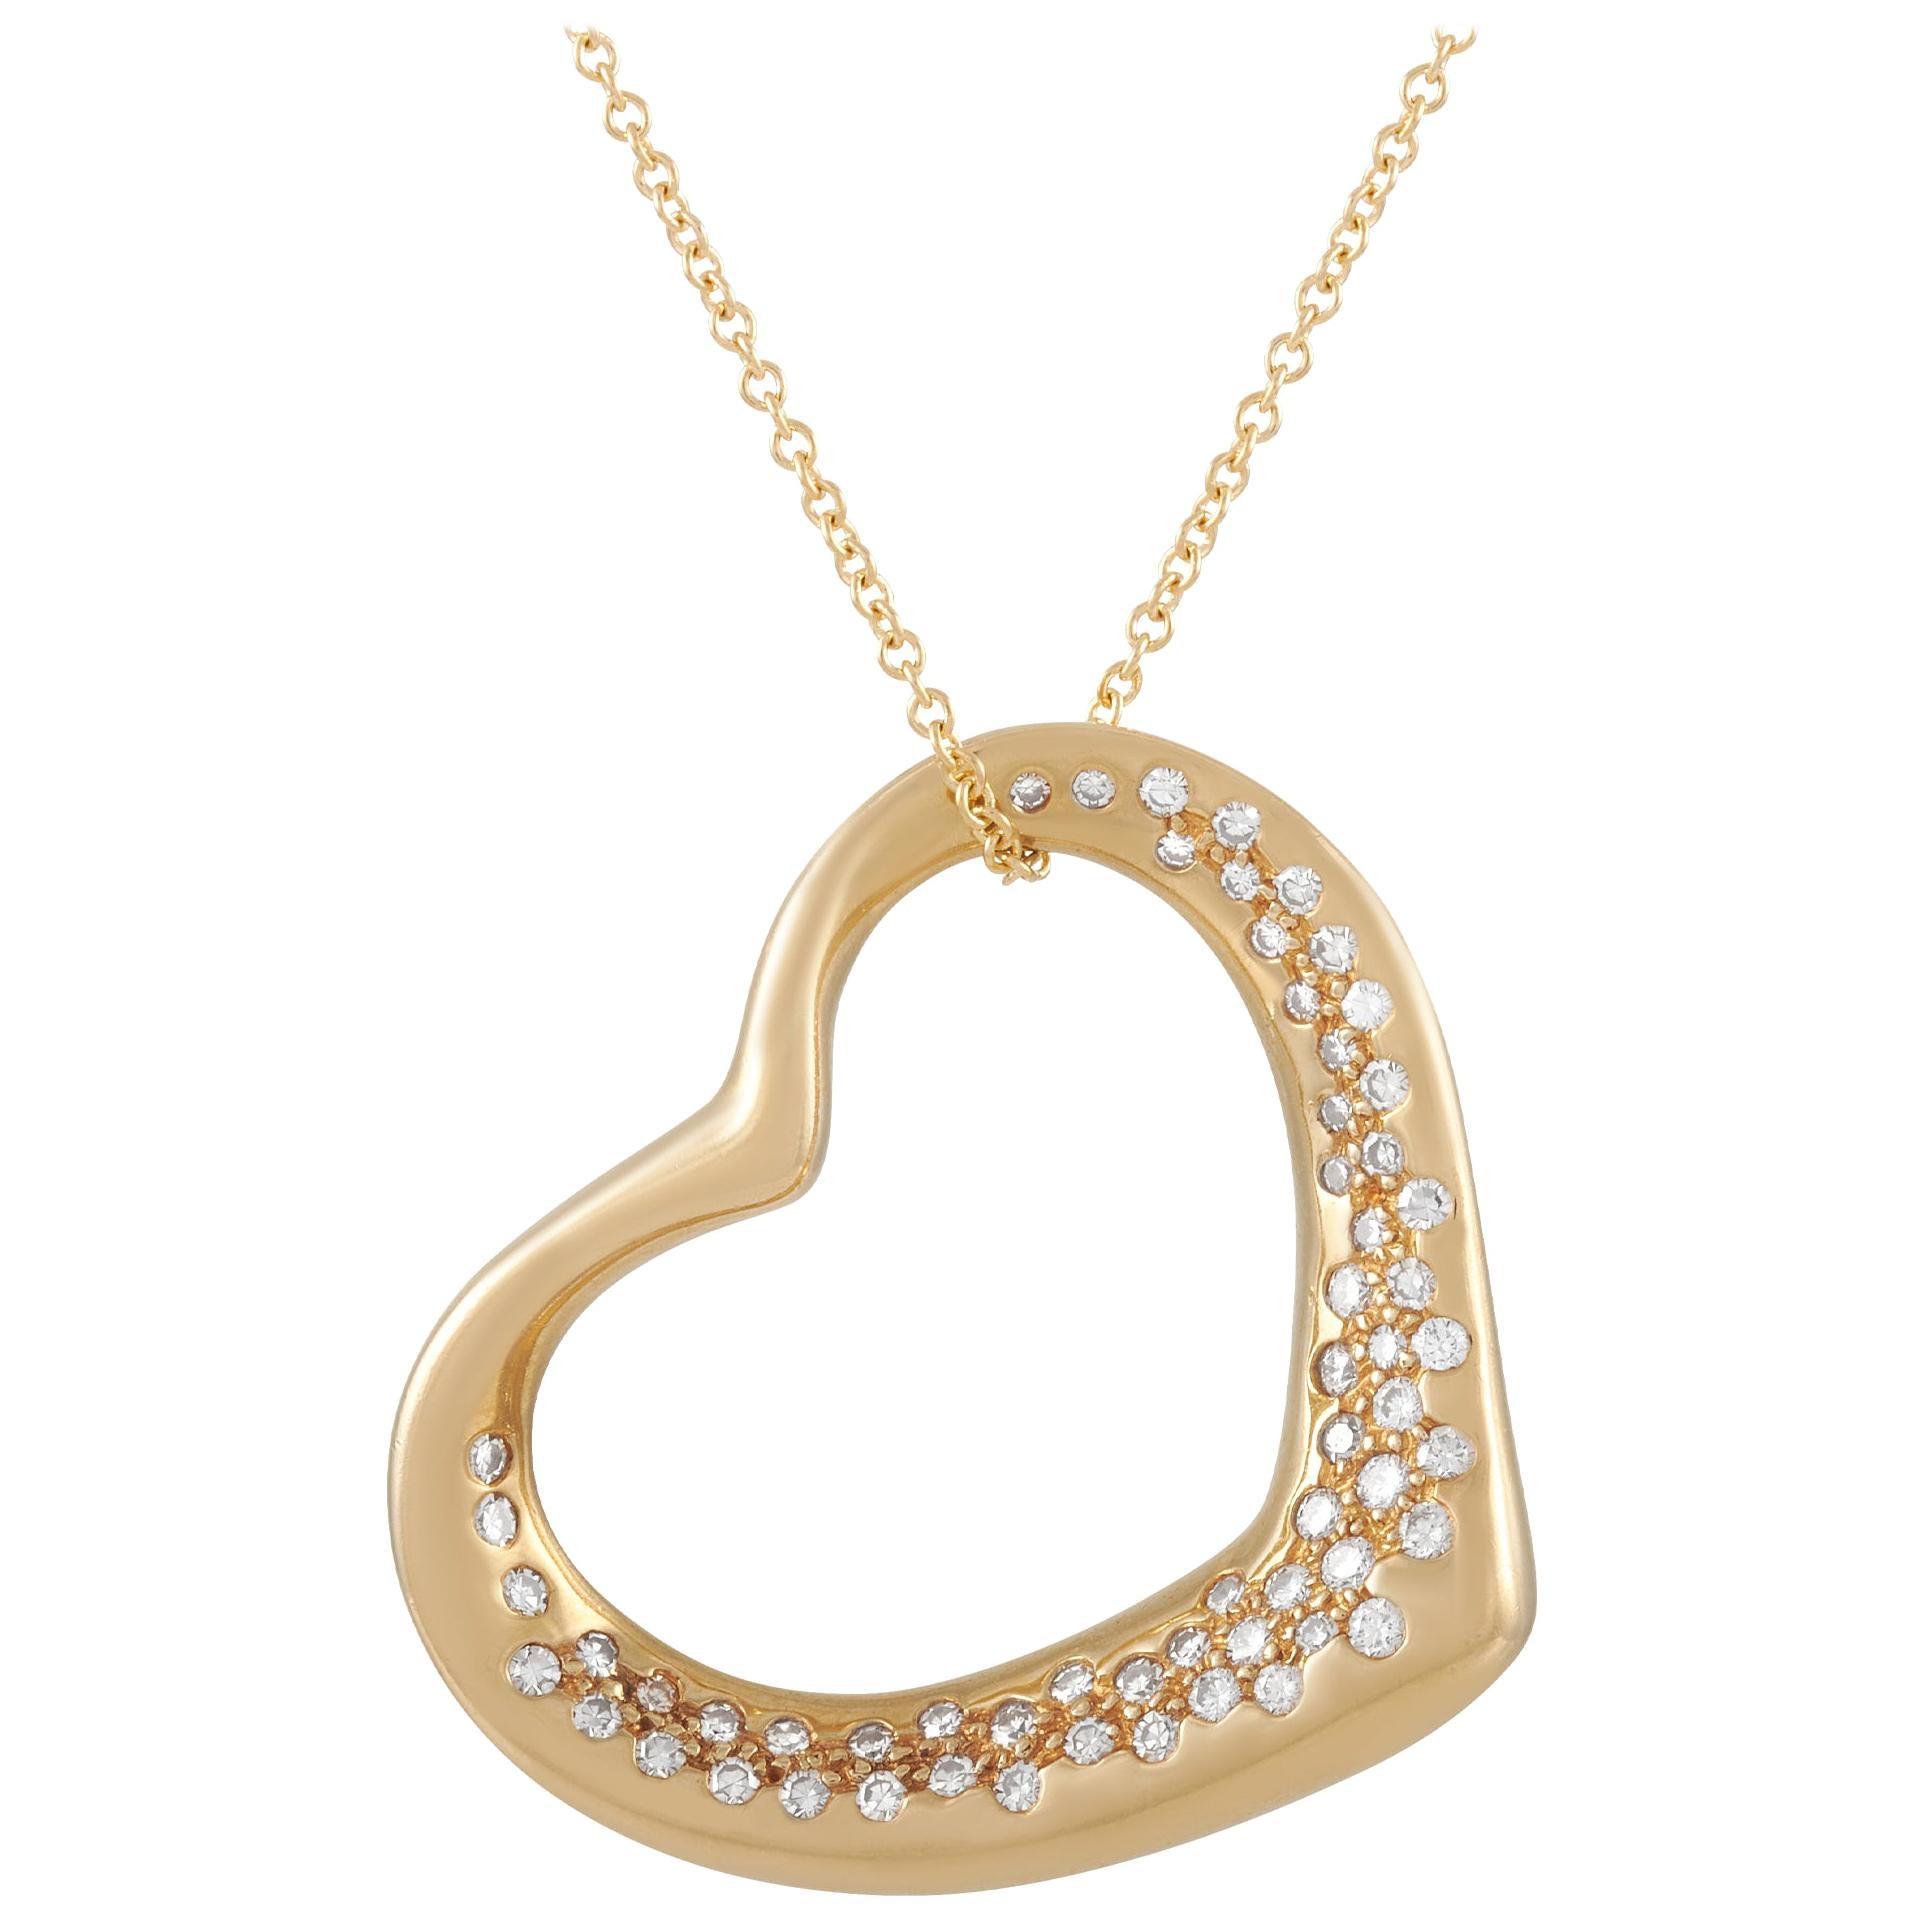 Tiffany & Co. Elsa Peretti 18K Yellow Gold 0.75 Carat Diamond Heart Necklace